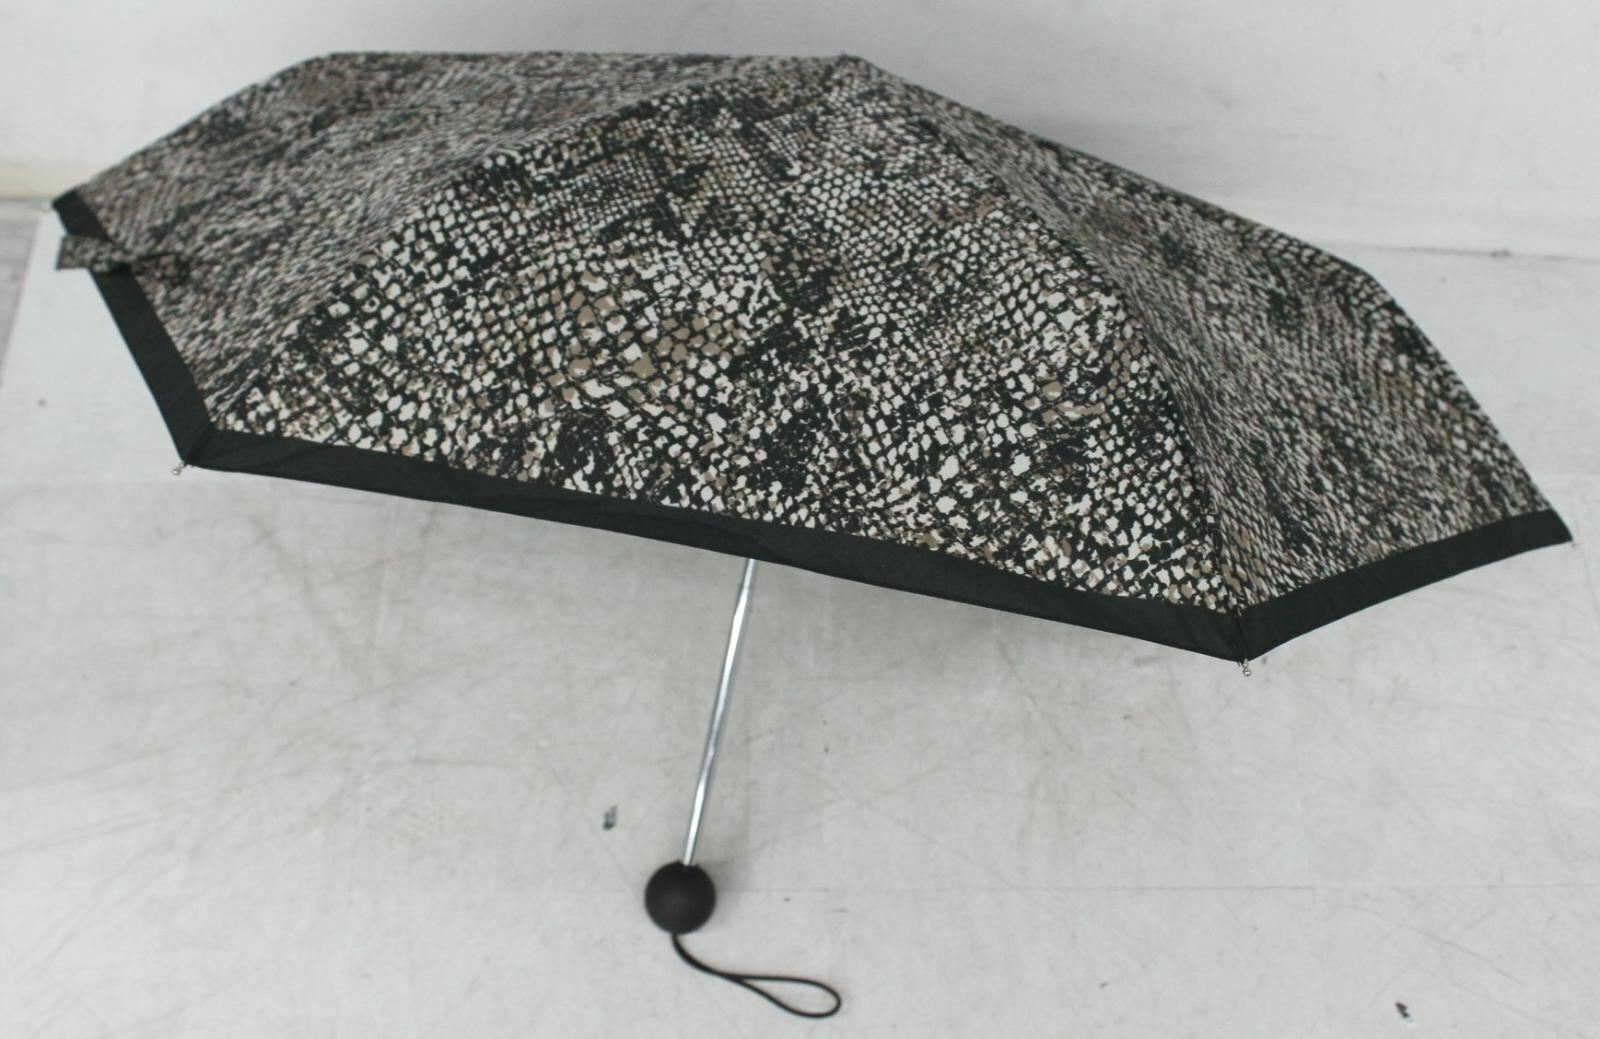 HOBBS Ladies Brown Snake Print Round Handle Compact Foldable Umbrella FAULTY